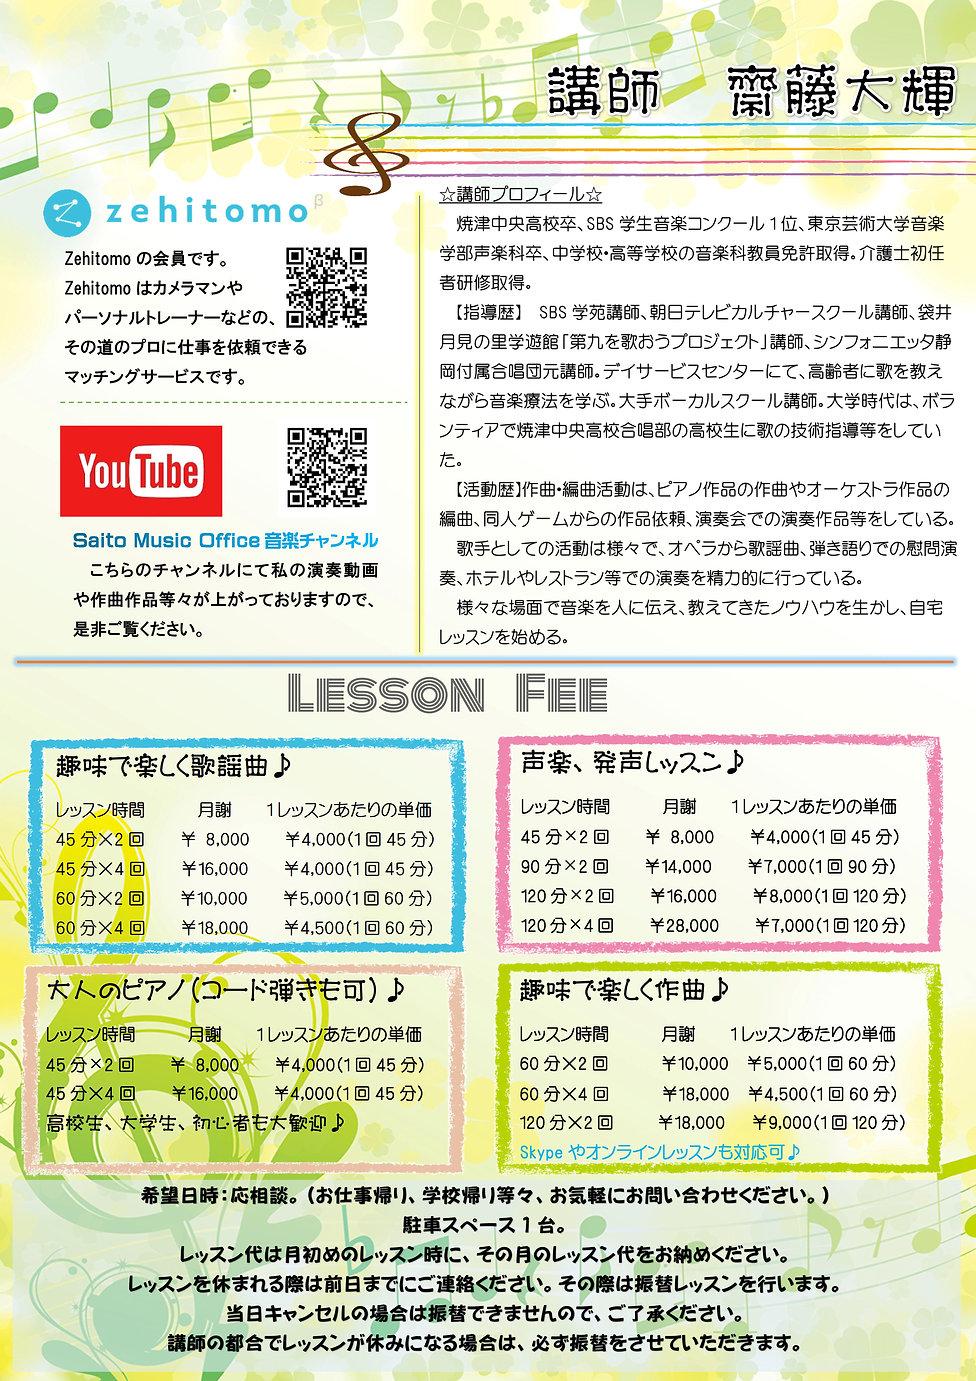 Microsoft Word - 音楽教室 フライヤー2-02.jpg